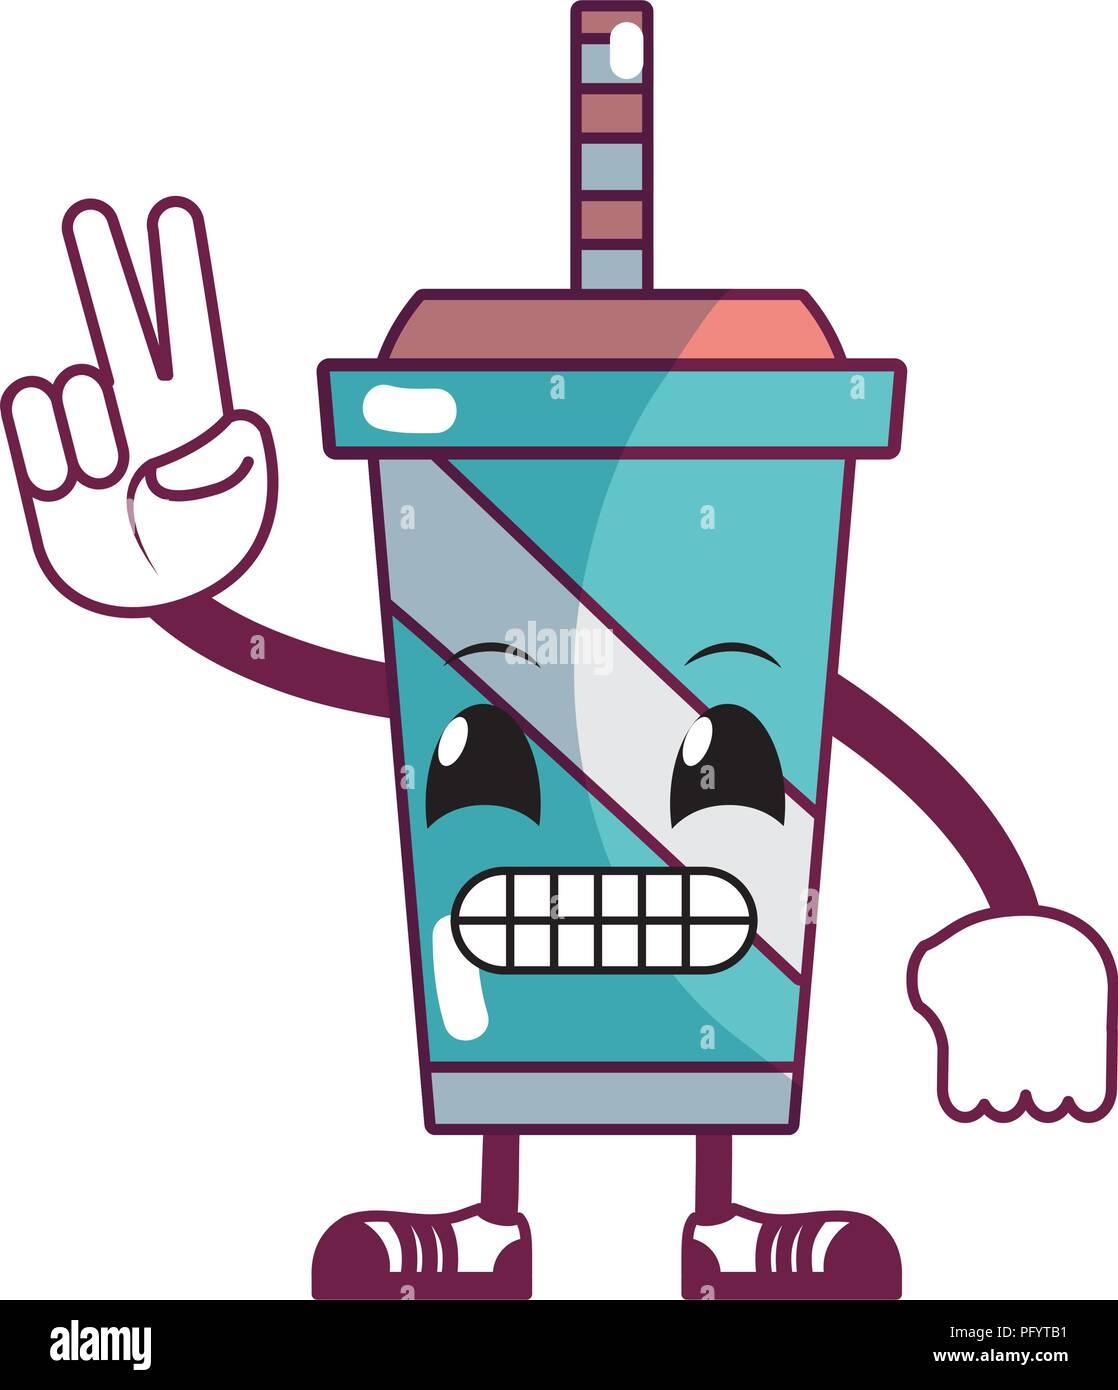 kawaii comical soda with arms and legs - Stock Image